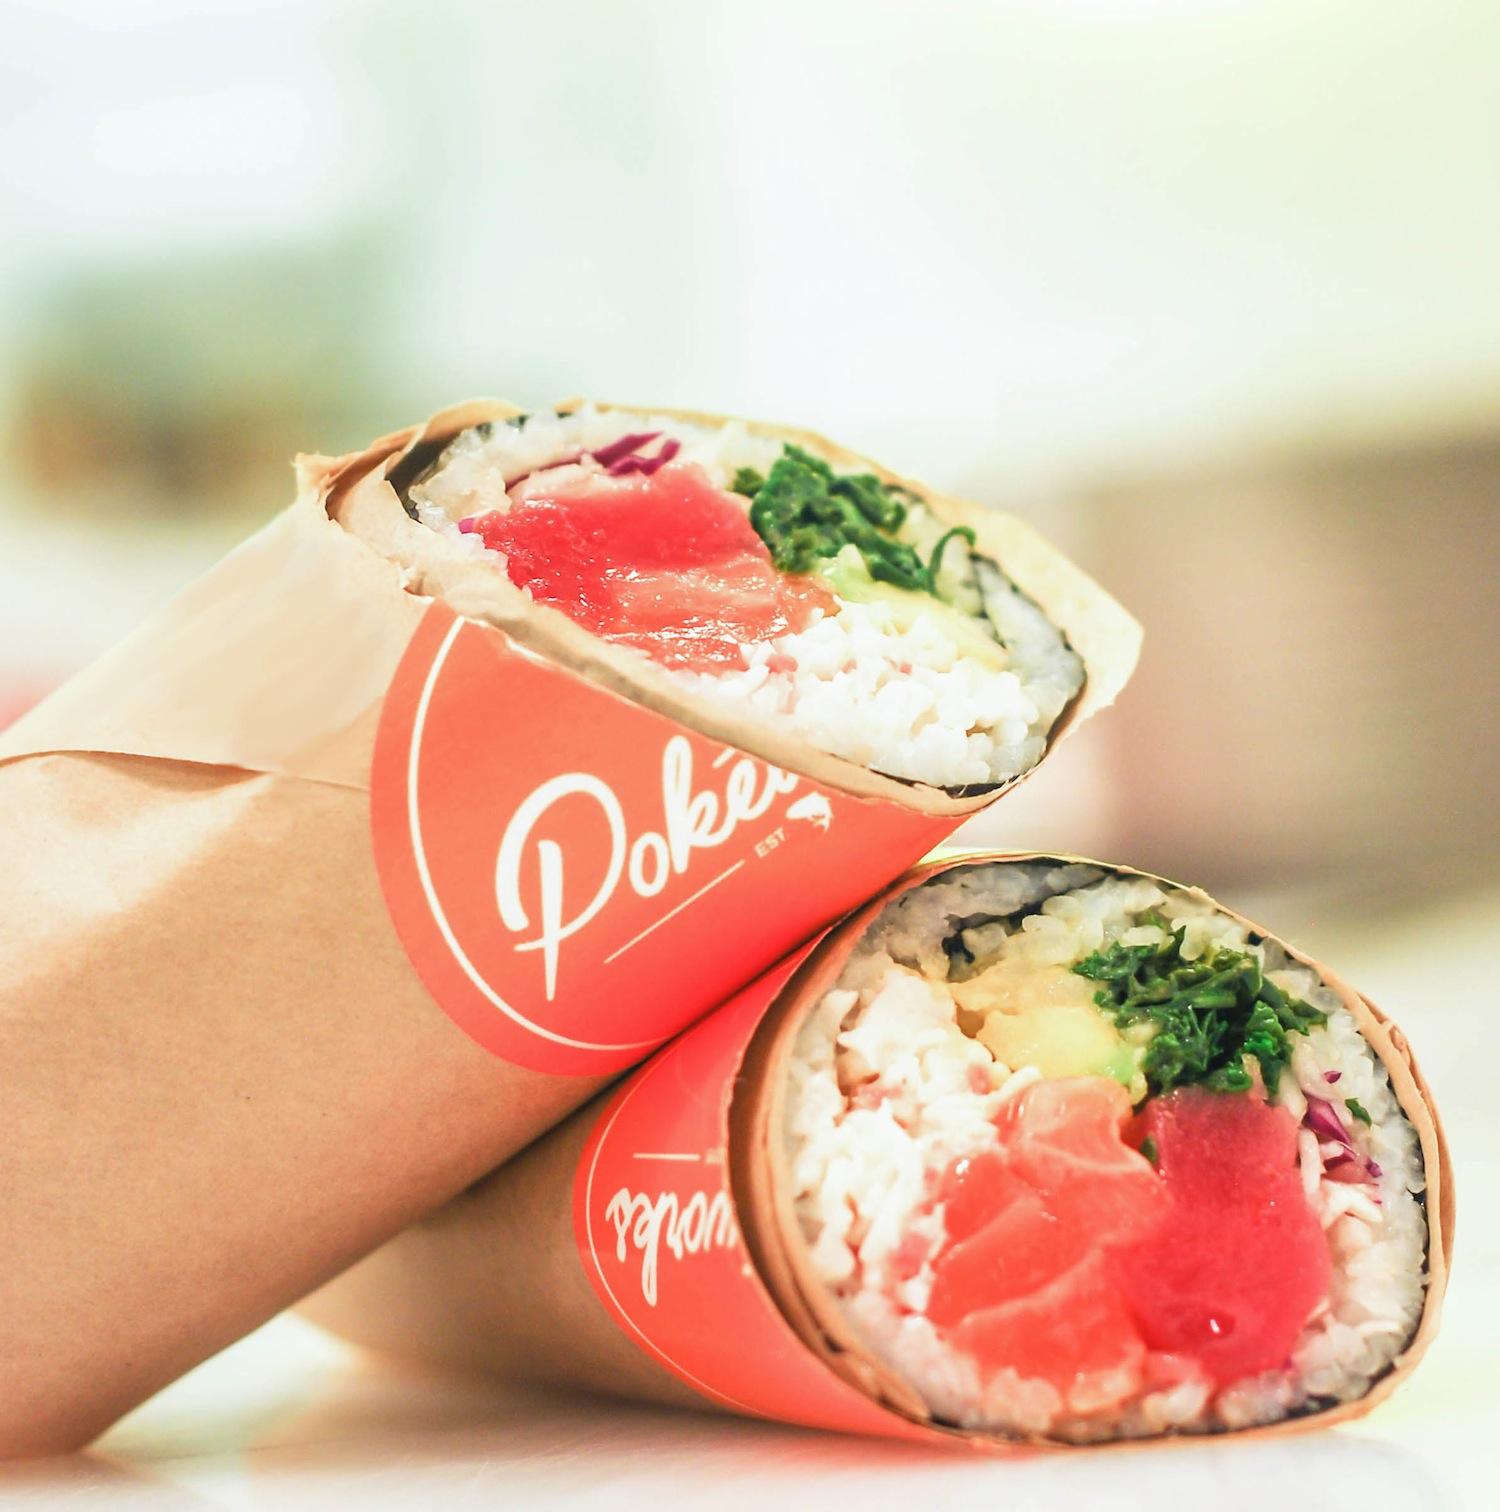 Poke_Sushi_Burrito_Wrapped